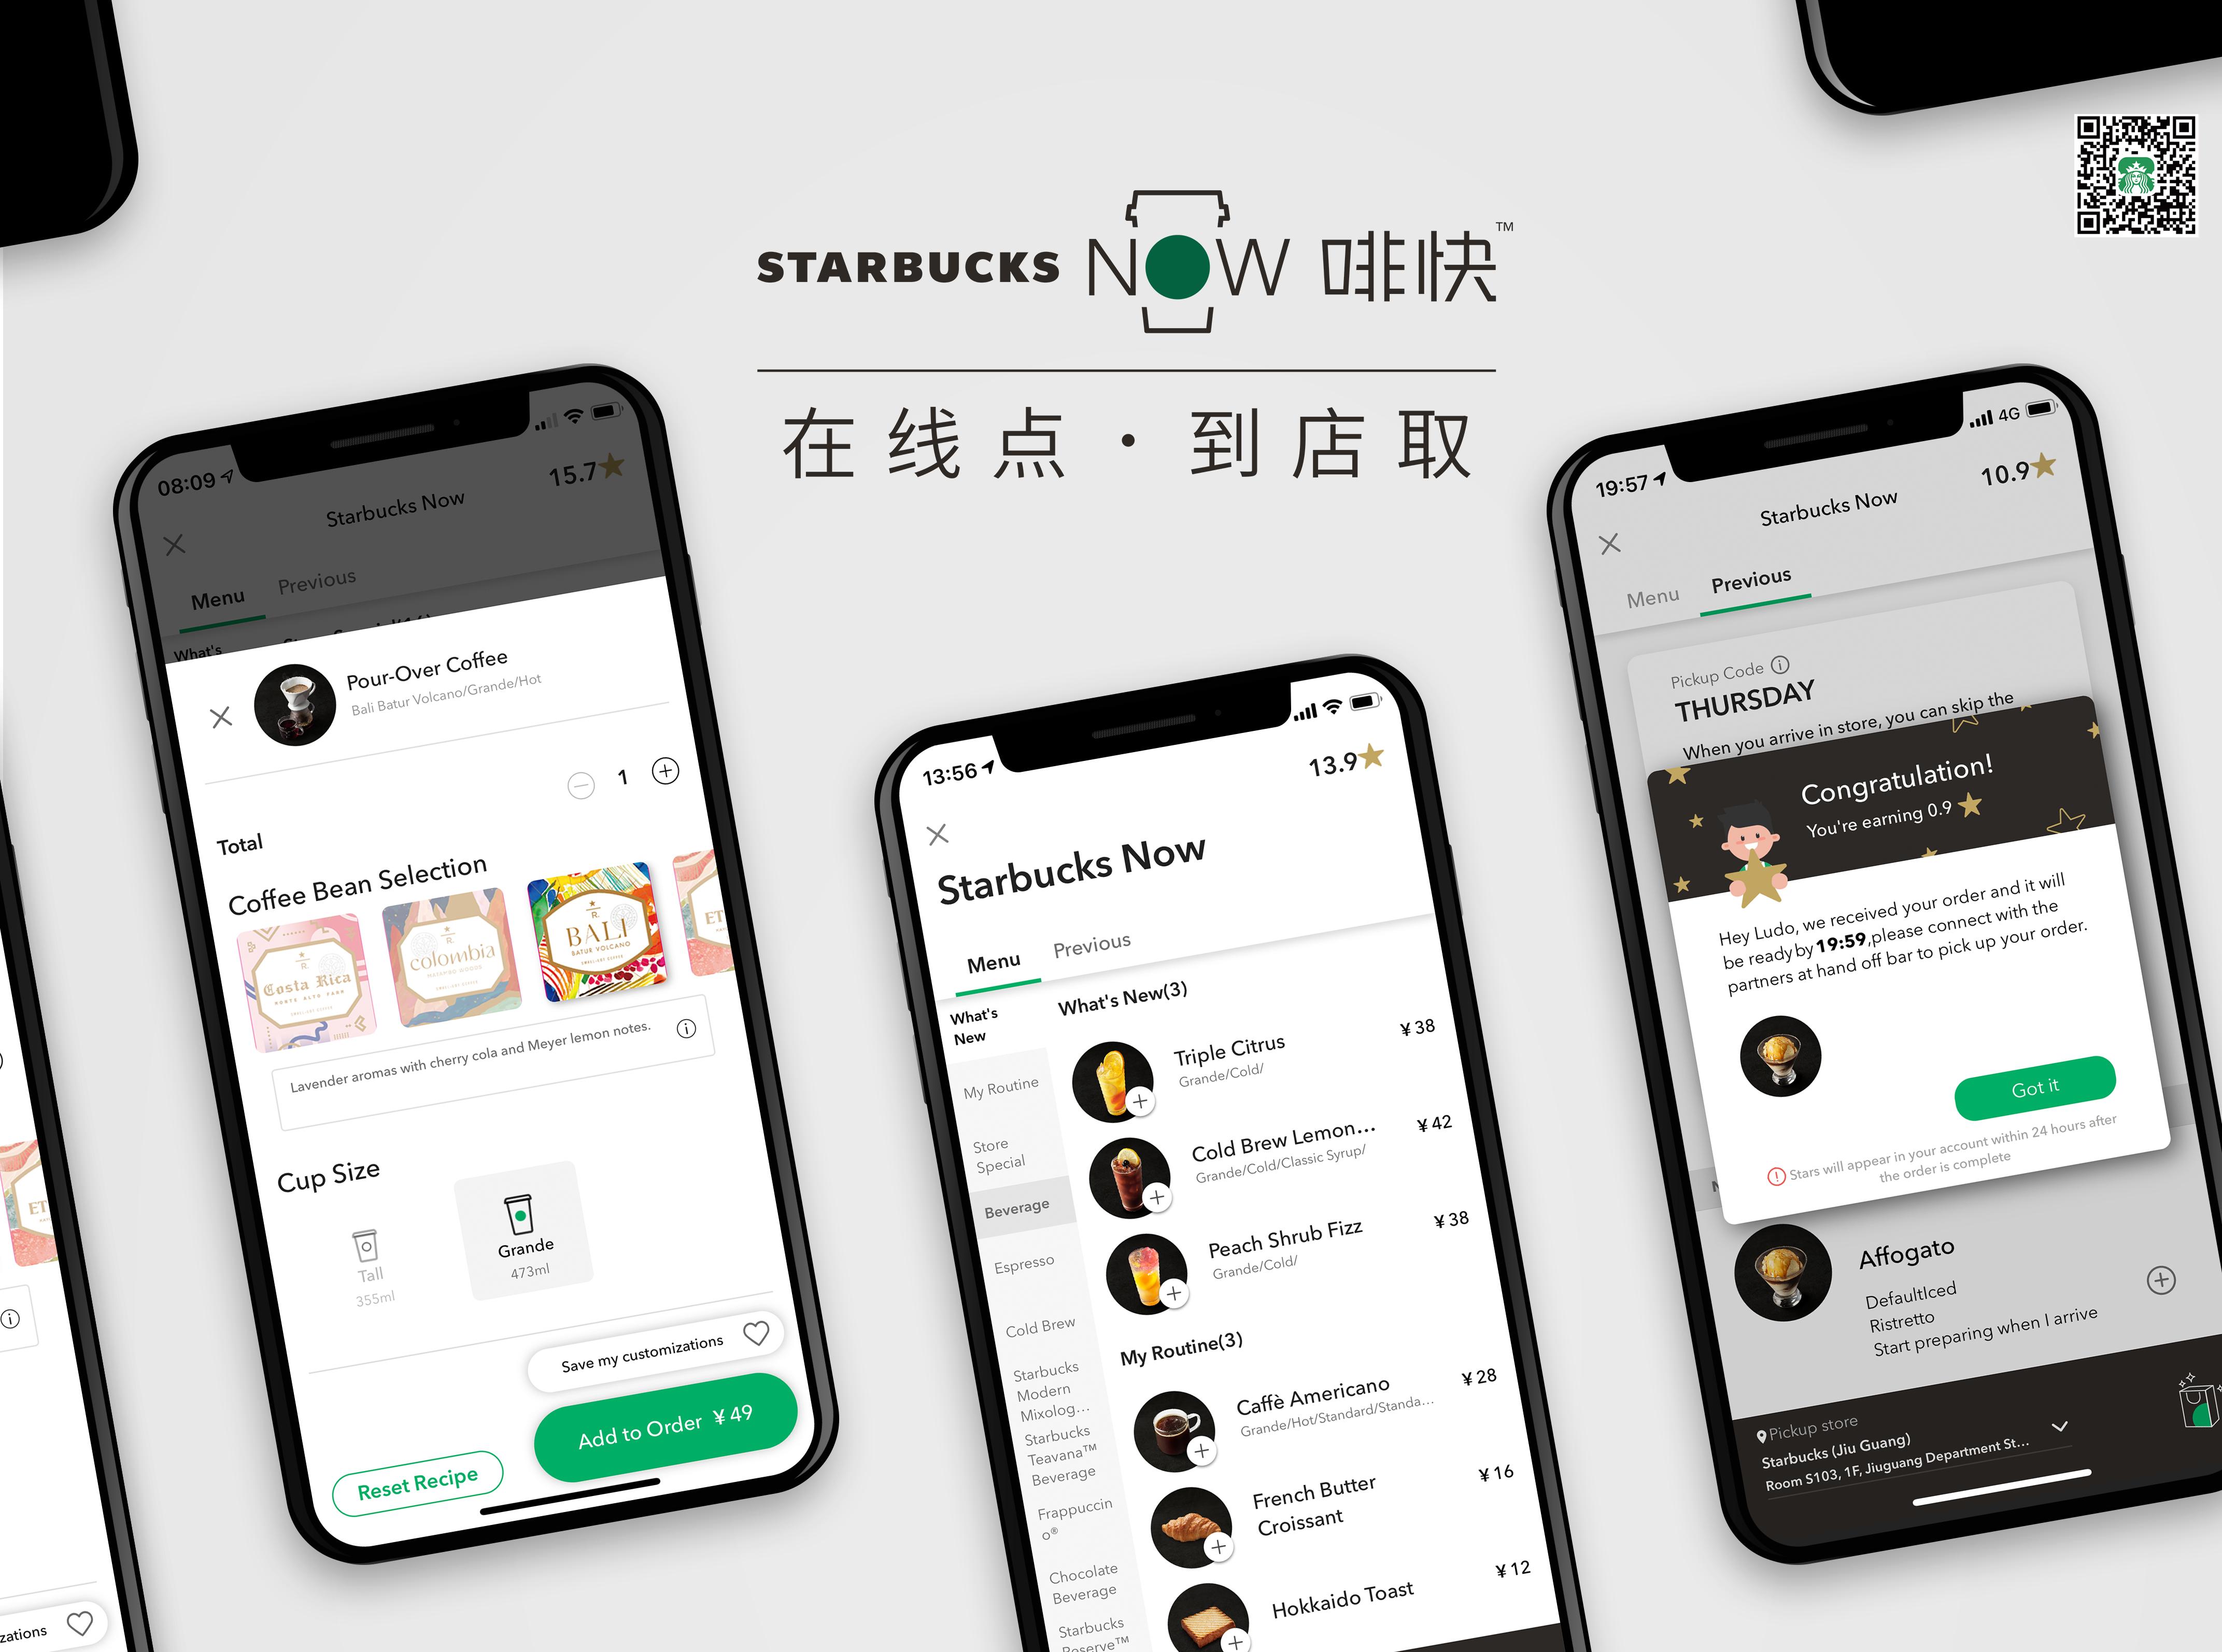 Image of Starbucks app in China